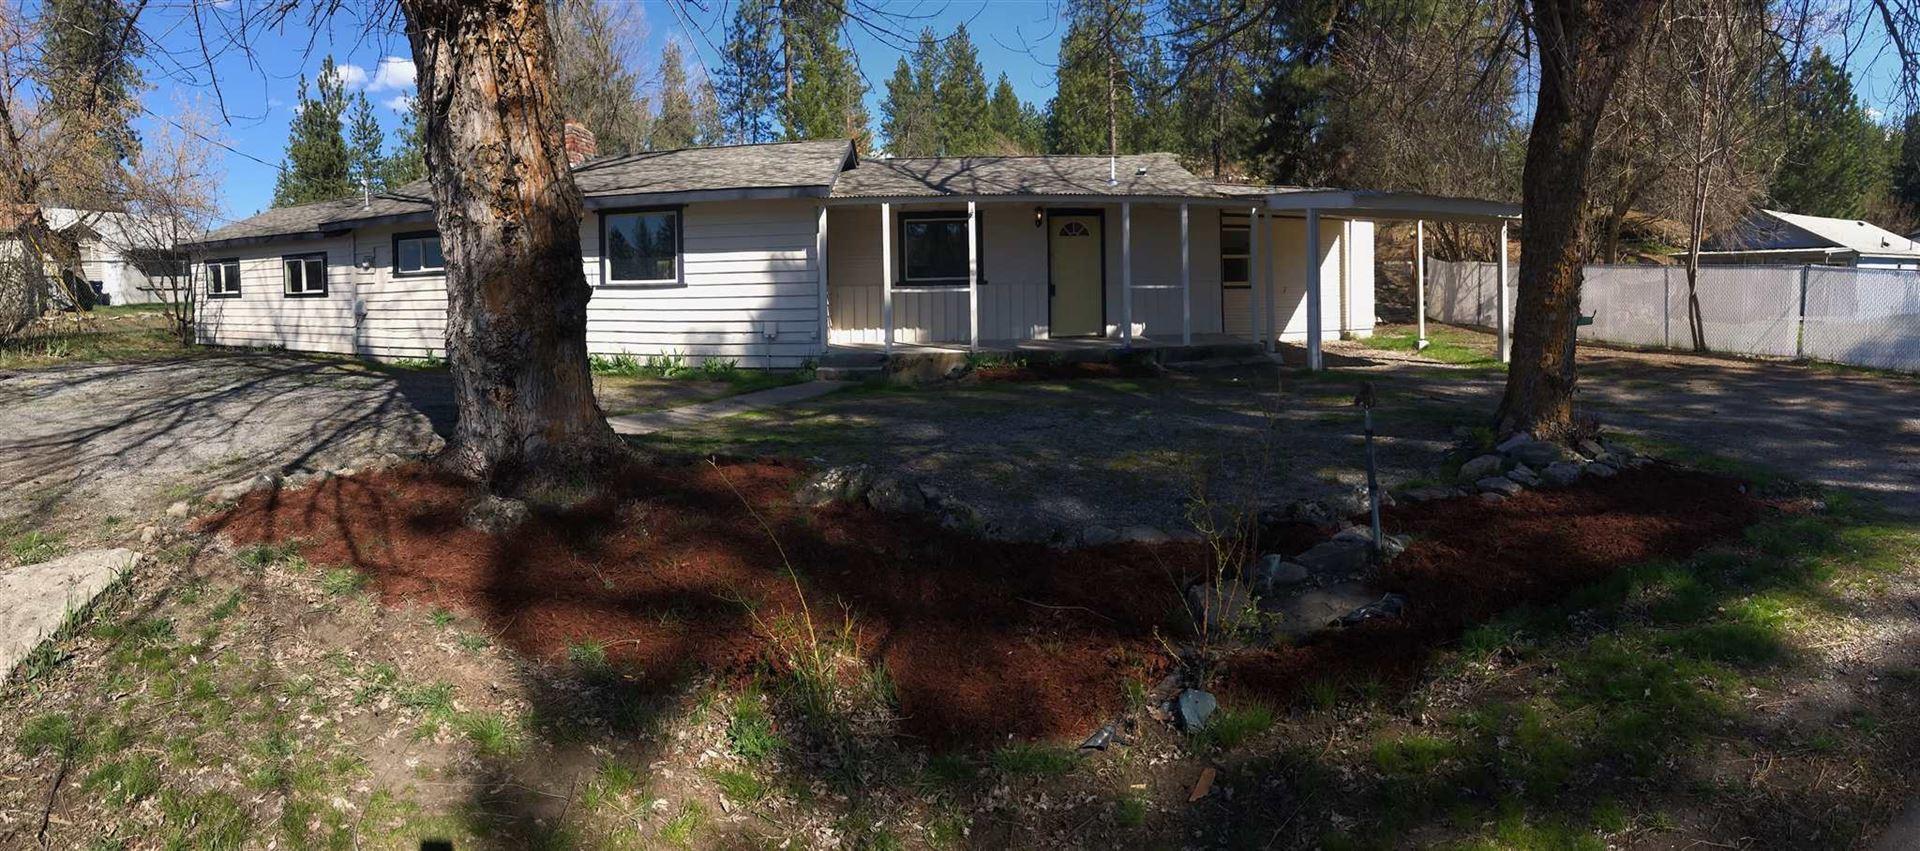 223 S Sargent Rd, Spokane Valley, WA 99212 - #: 202114105